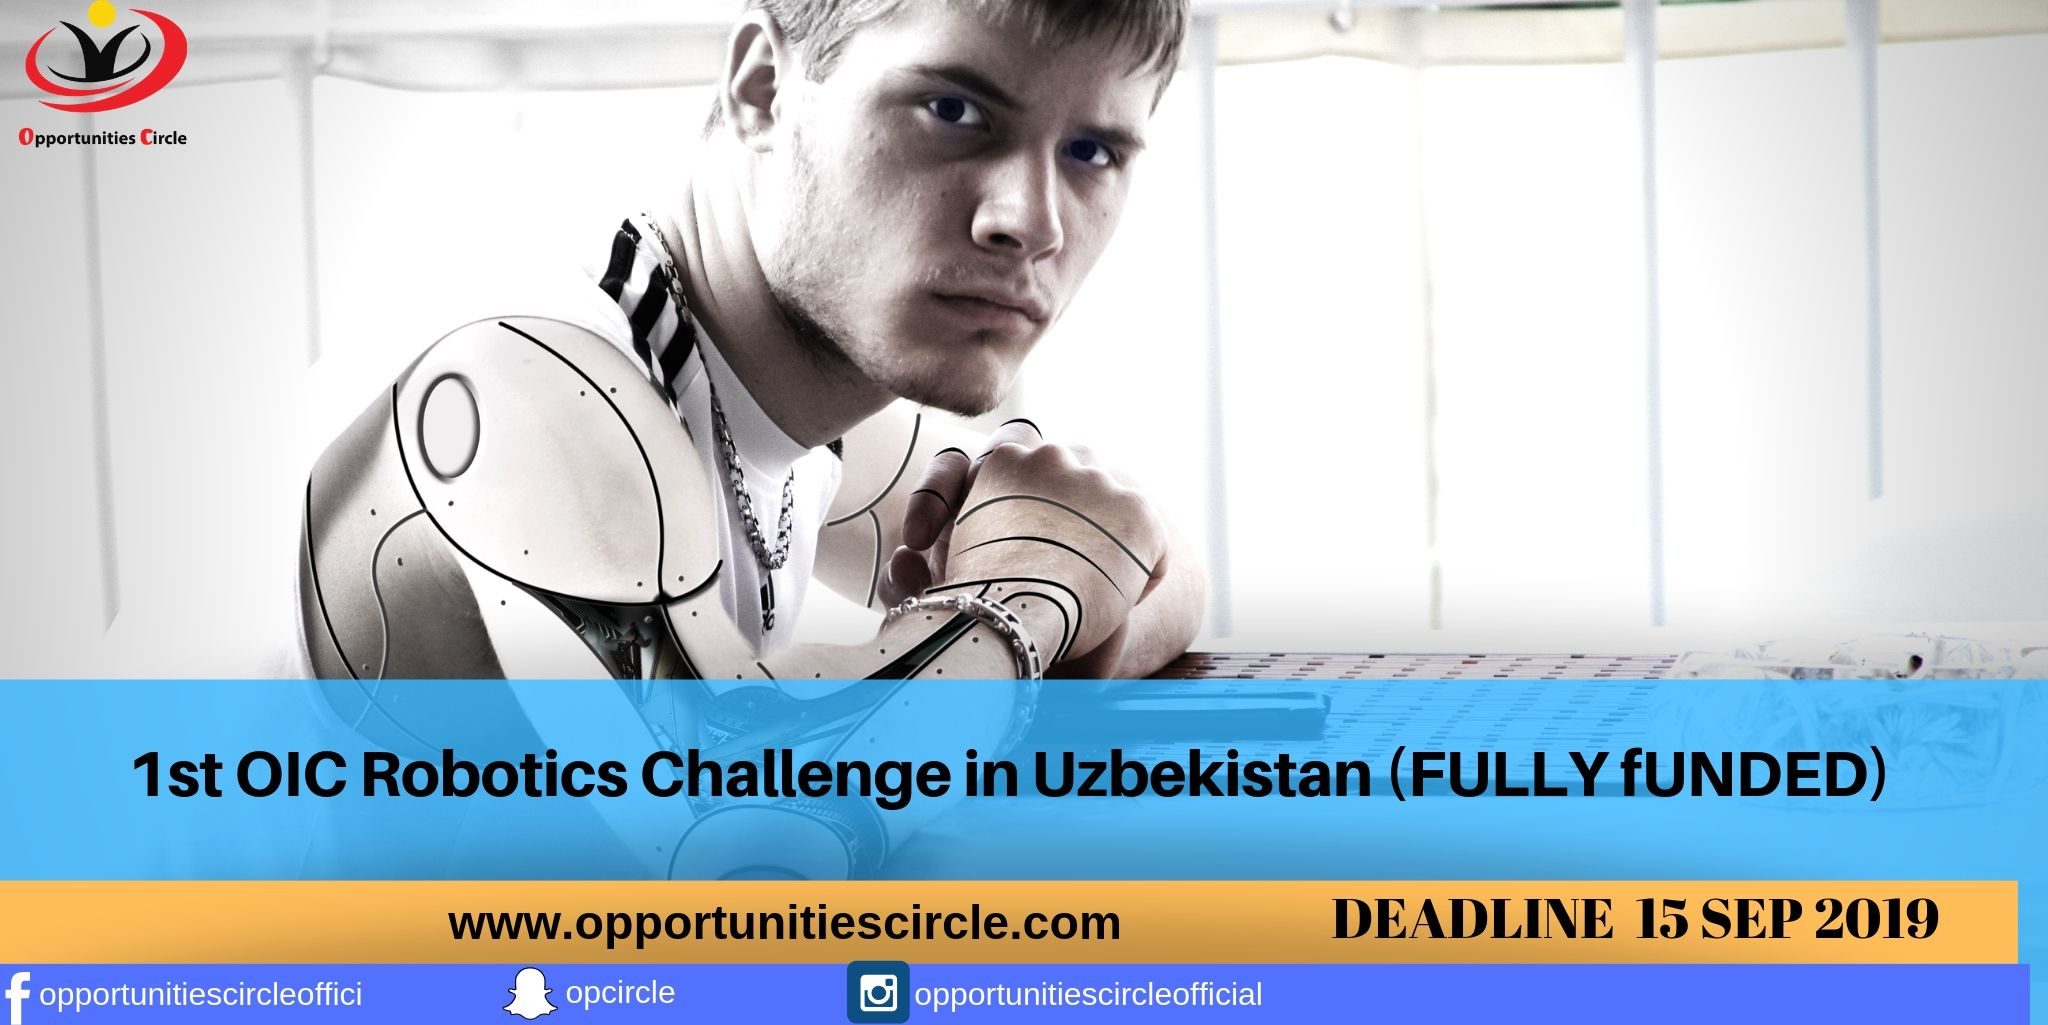 1st OIC Robotics Challenge in Uzbekistan - Opportunities Circle